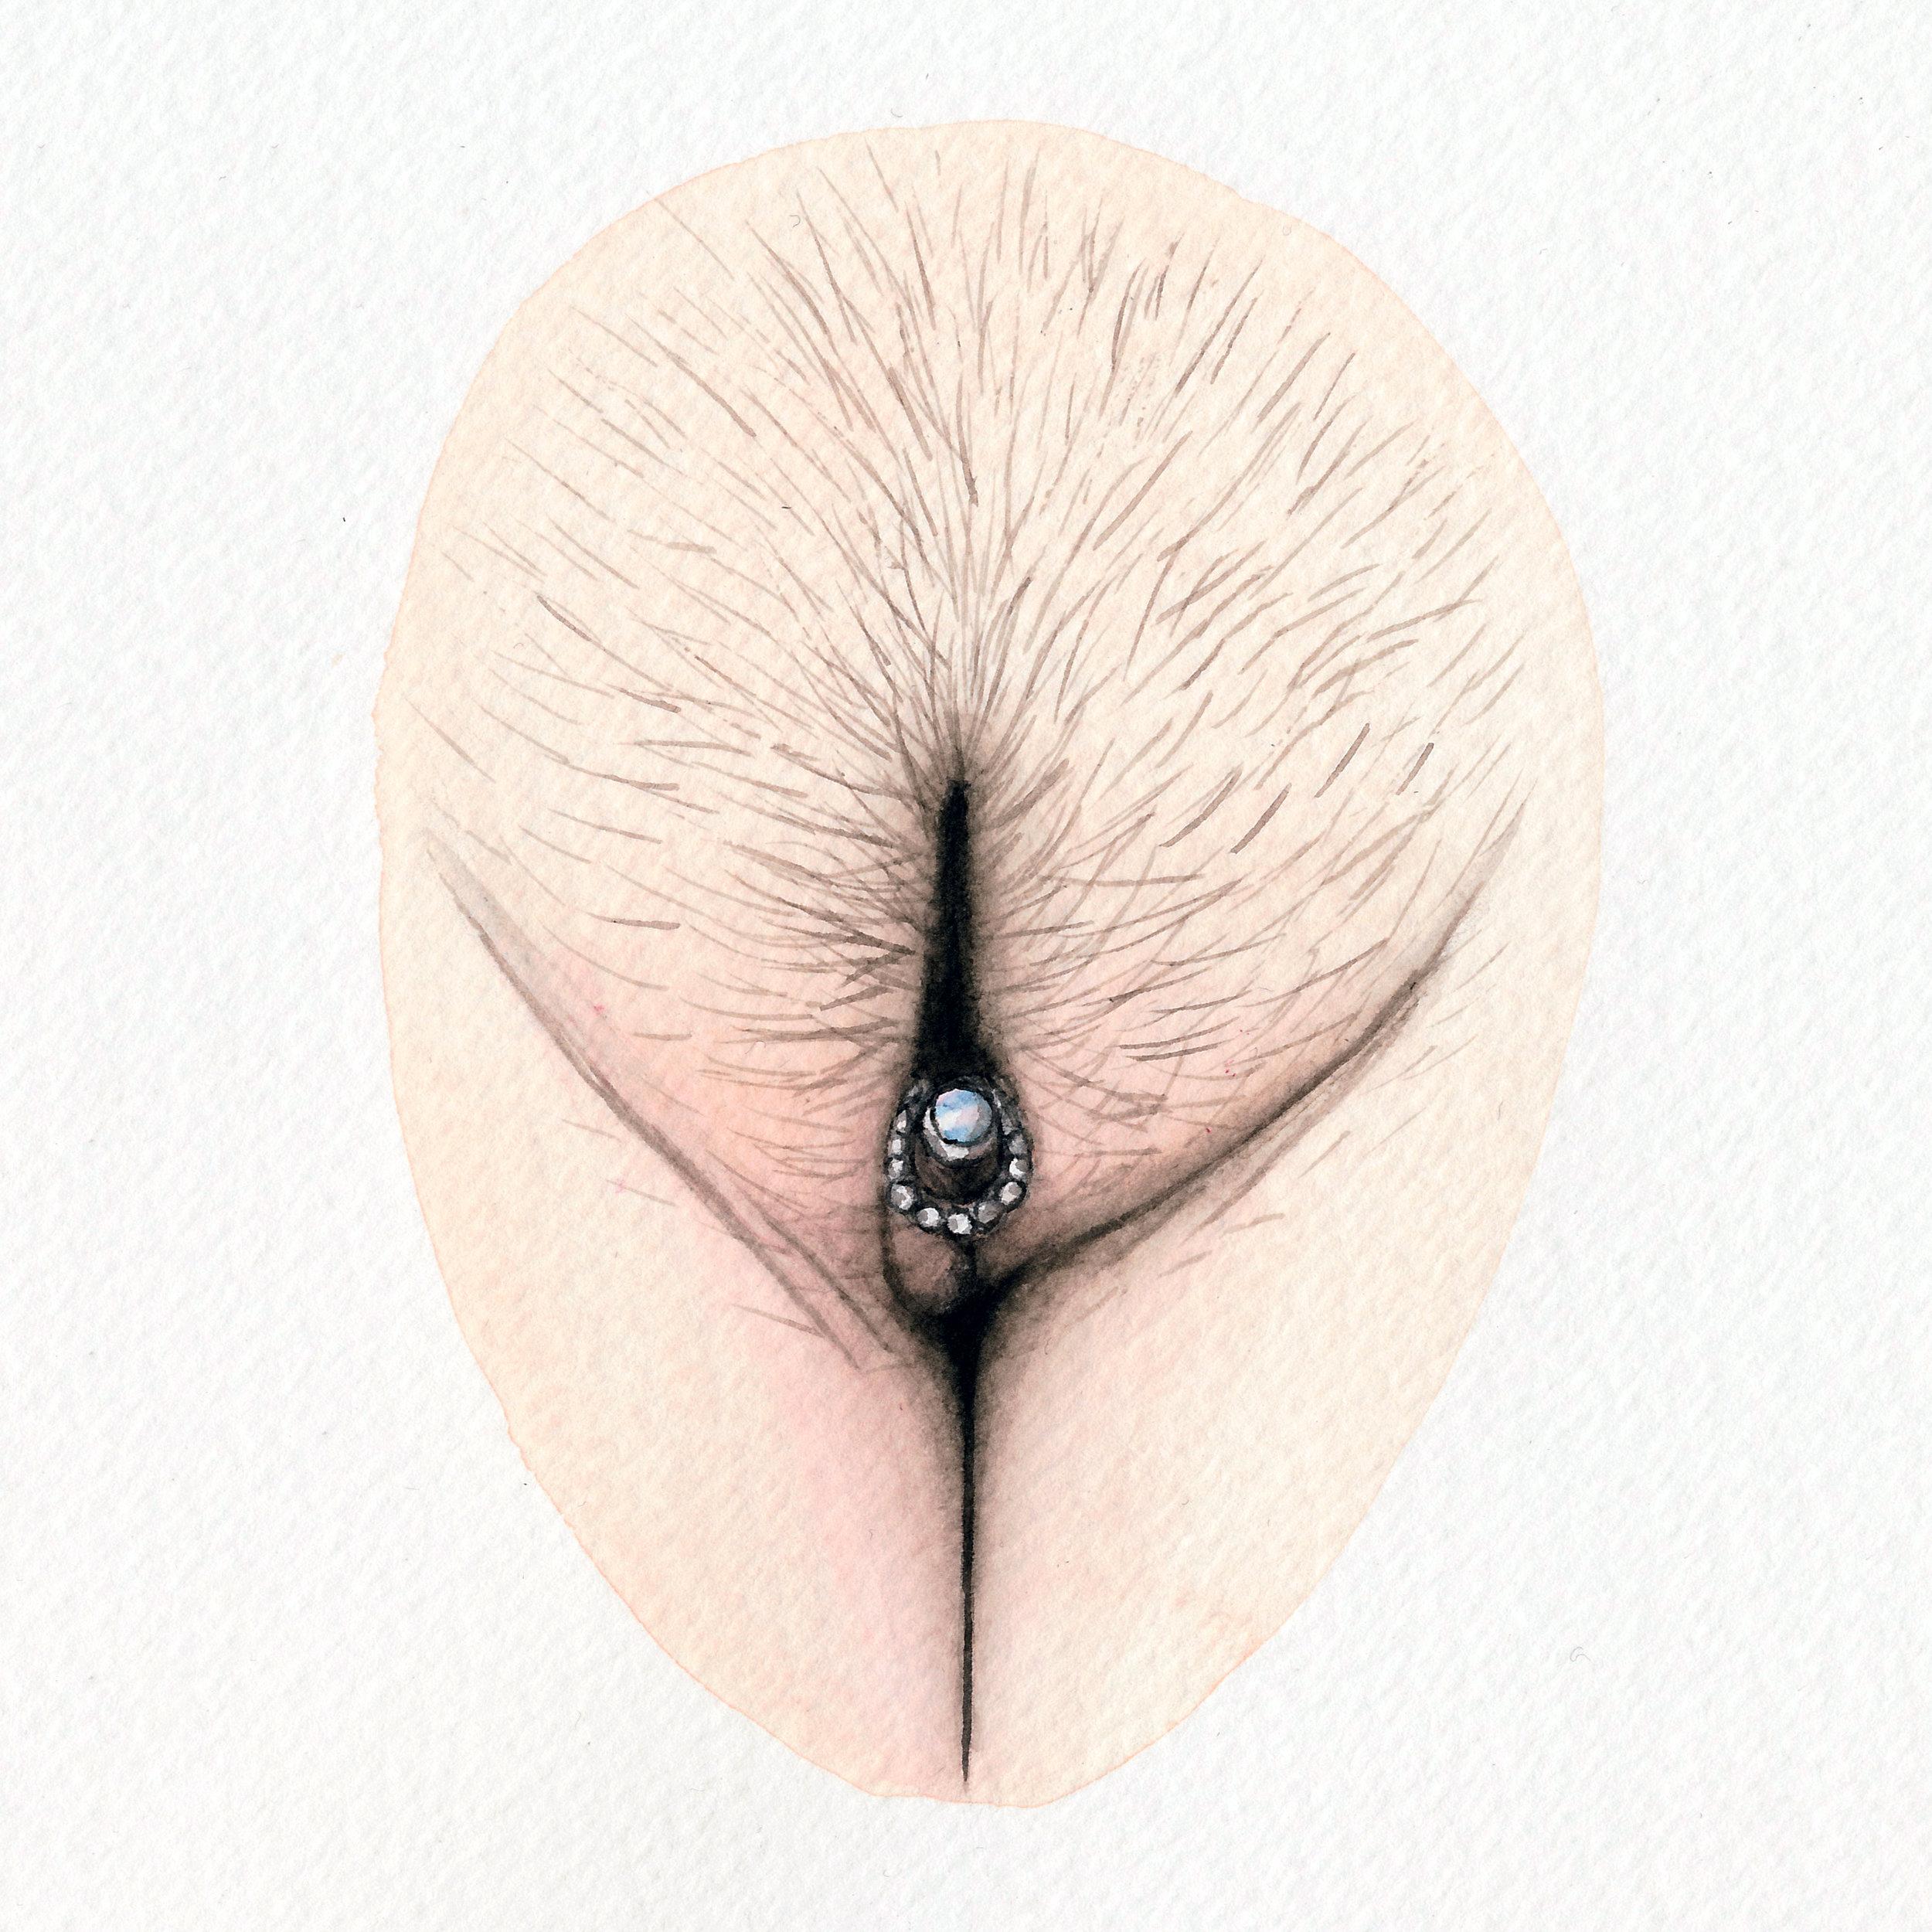 The Vulva Gallery - Vulva Portrait #161 (s).jpg